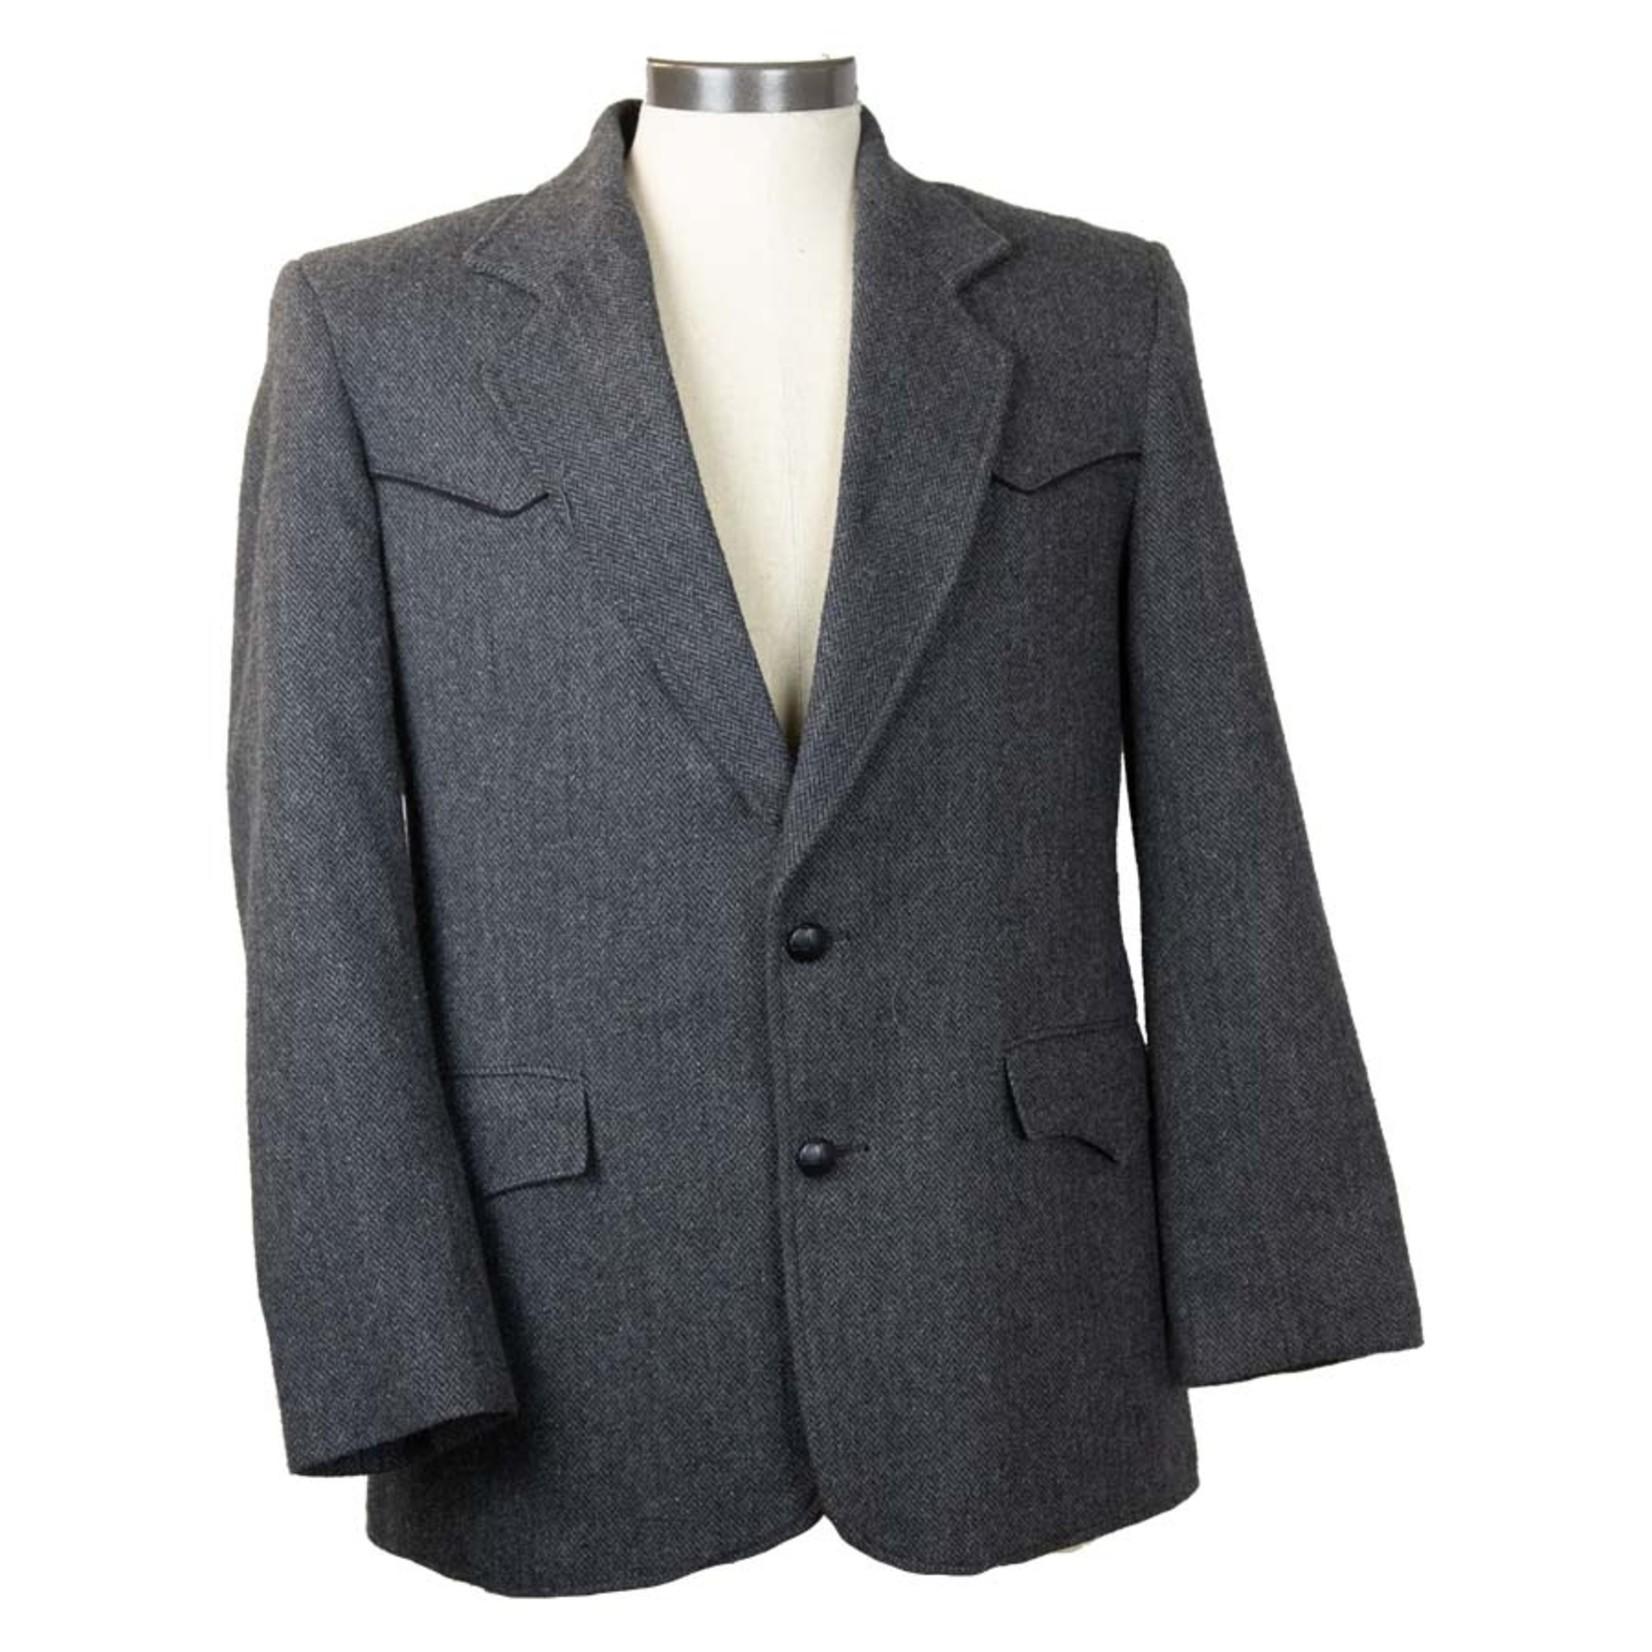 Pioneer Suits Polyester Wool Blend Vintage Suit Jacket - Size 40 - #17